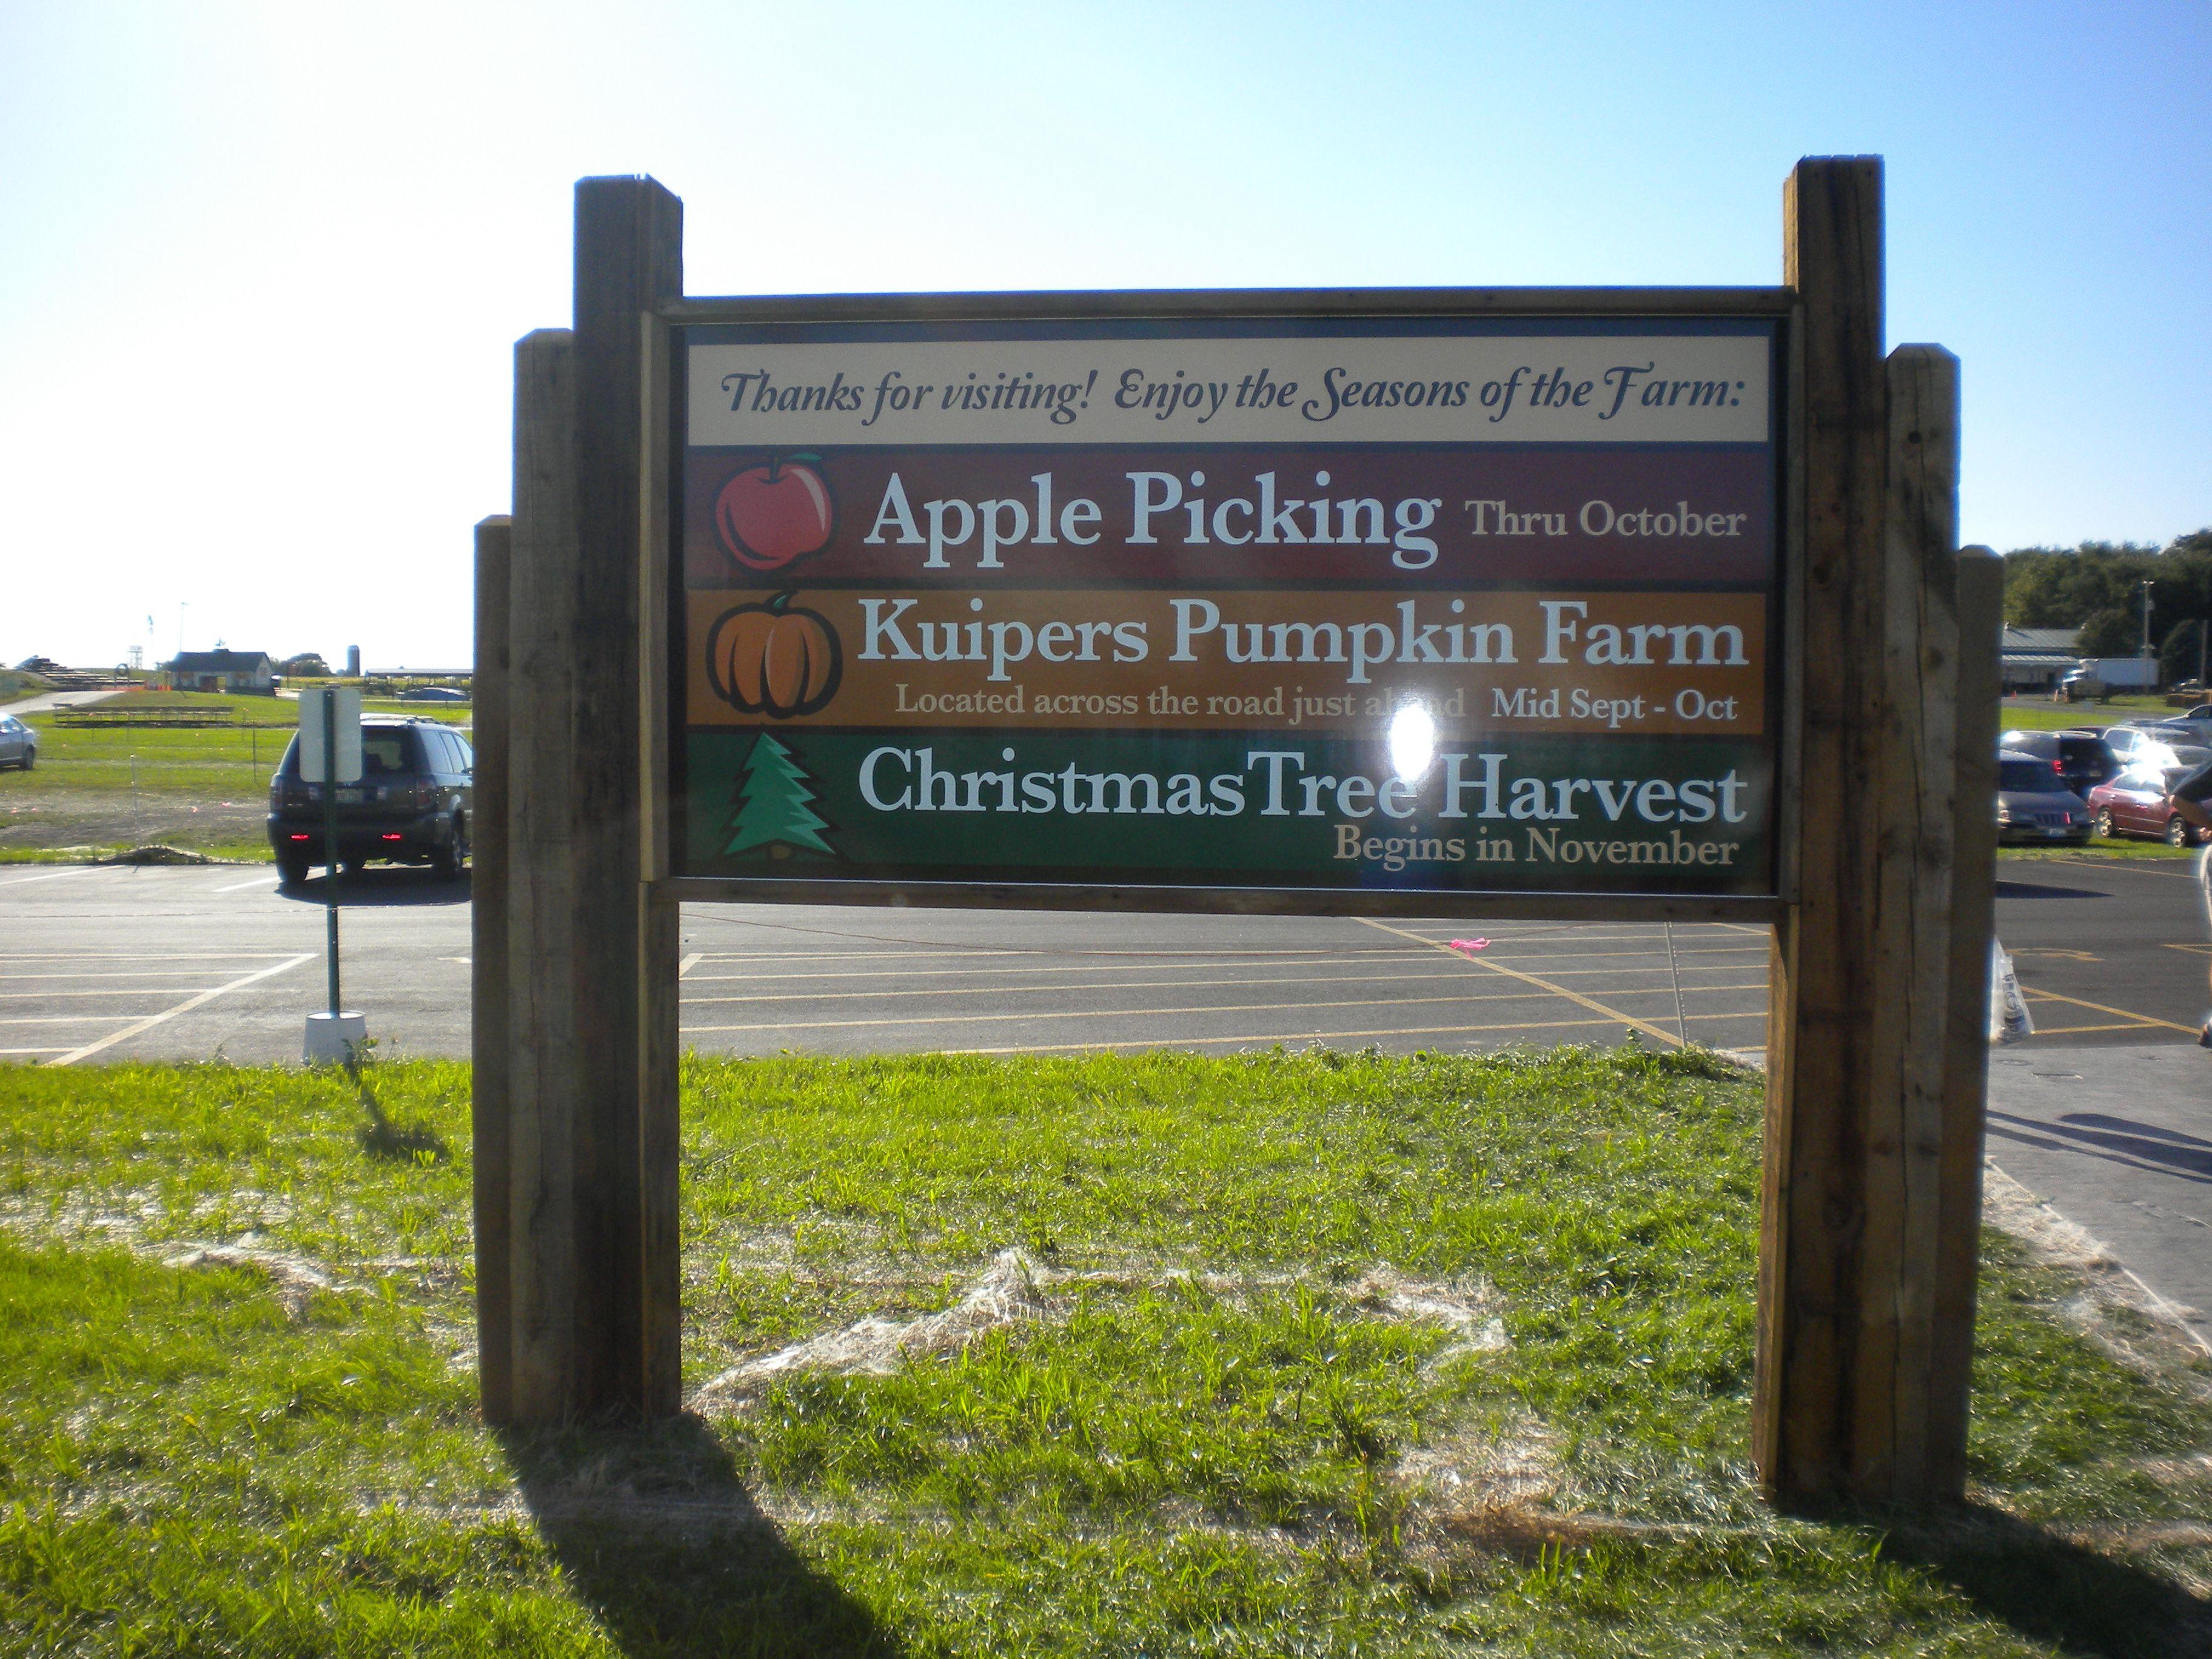 Kuipers Family Farm Pumpkin farm, Illinois, Small towns